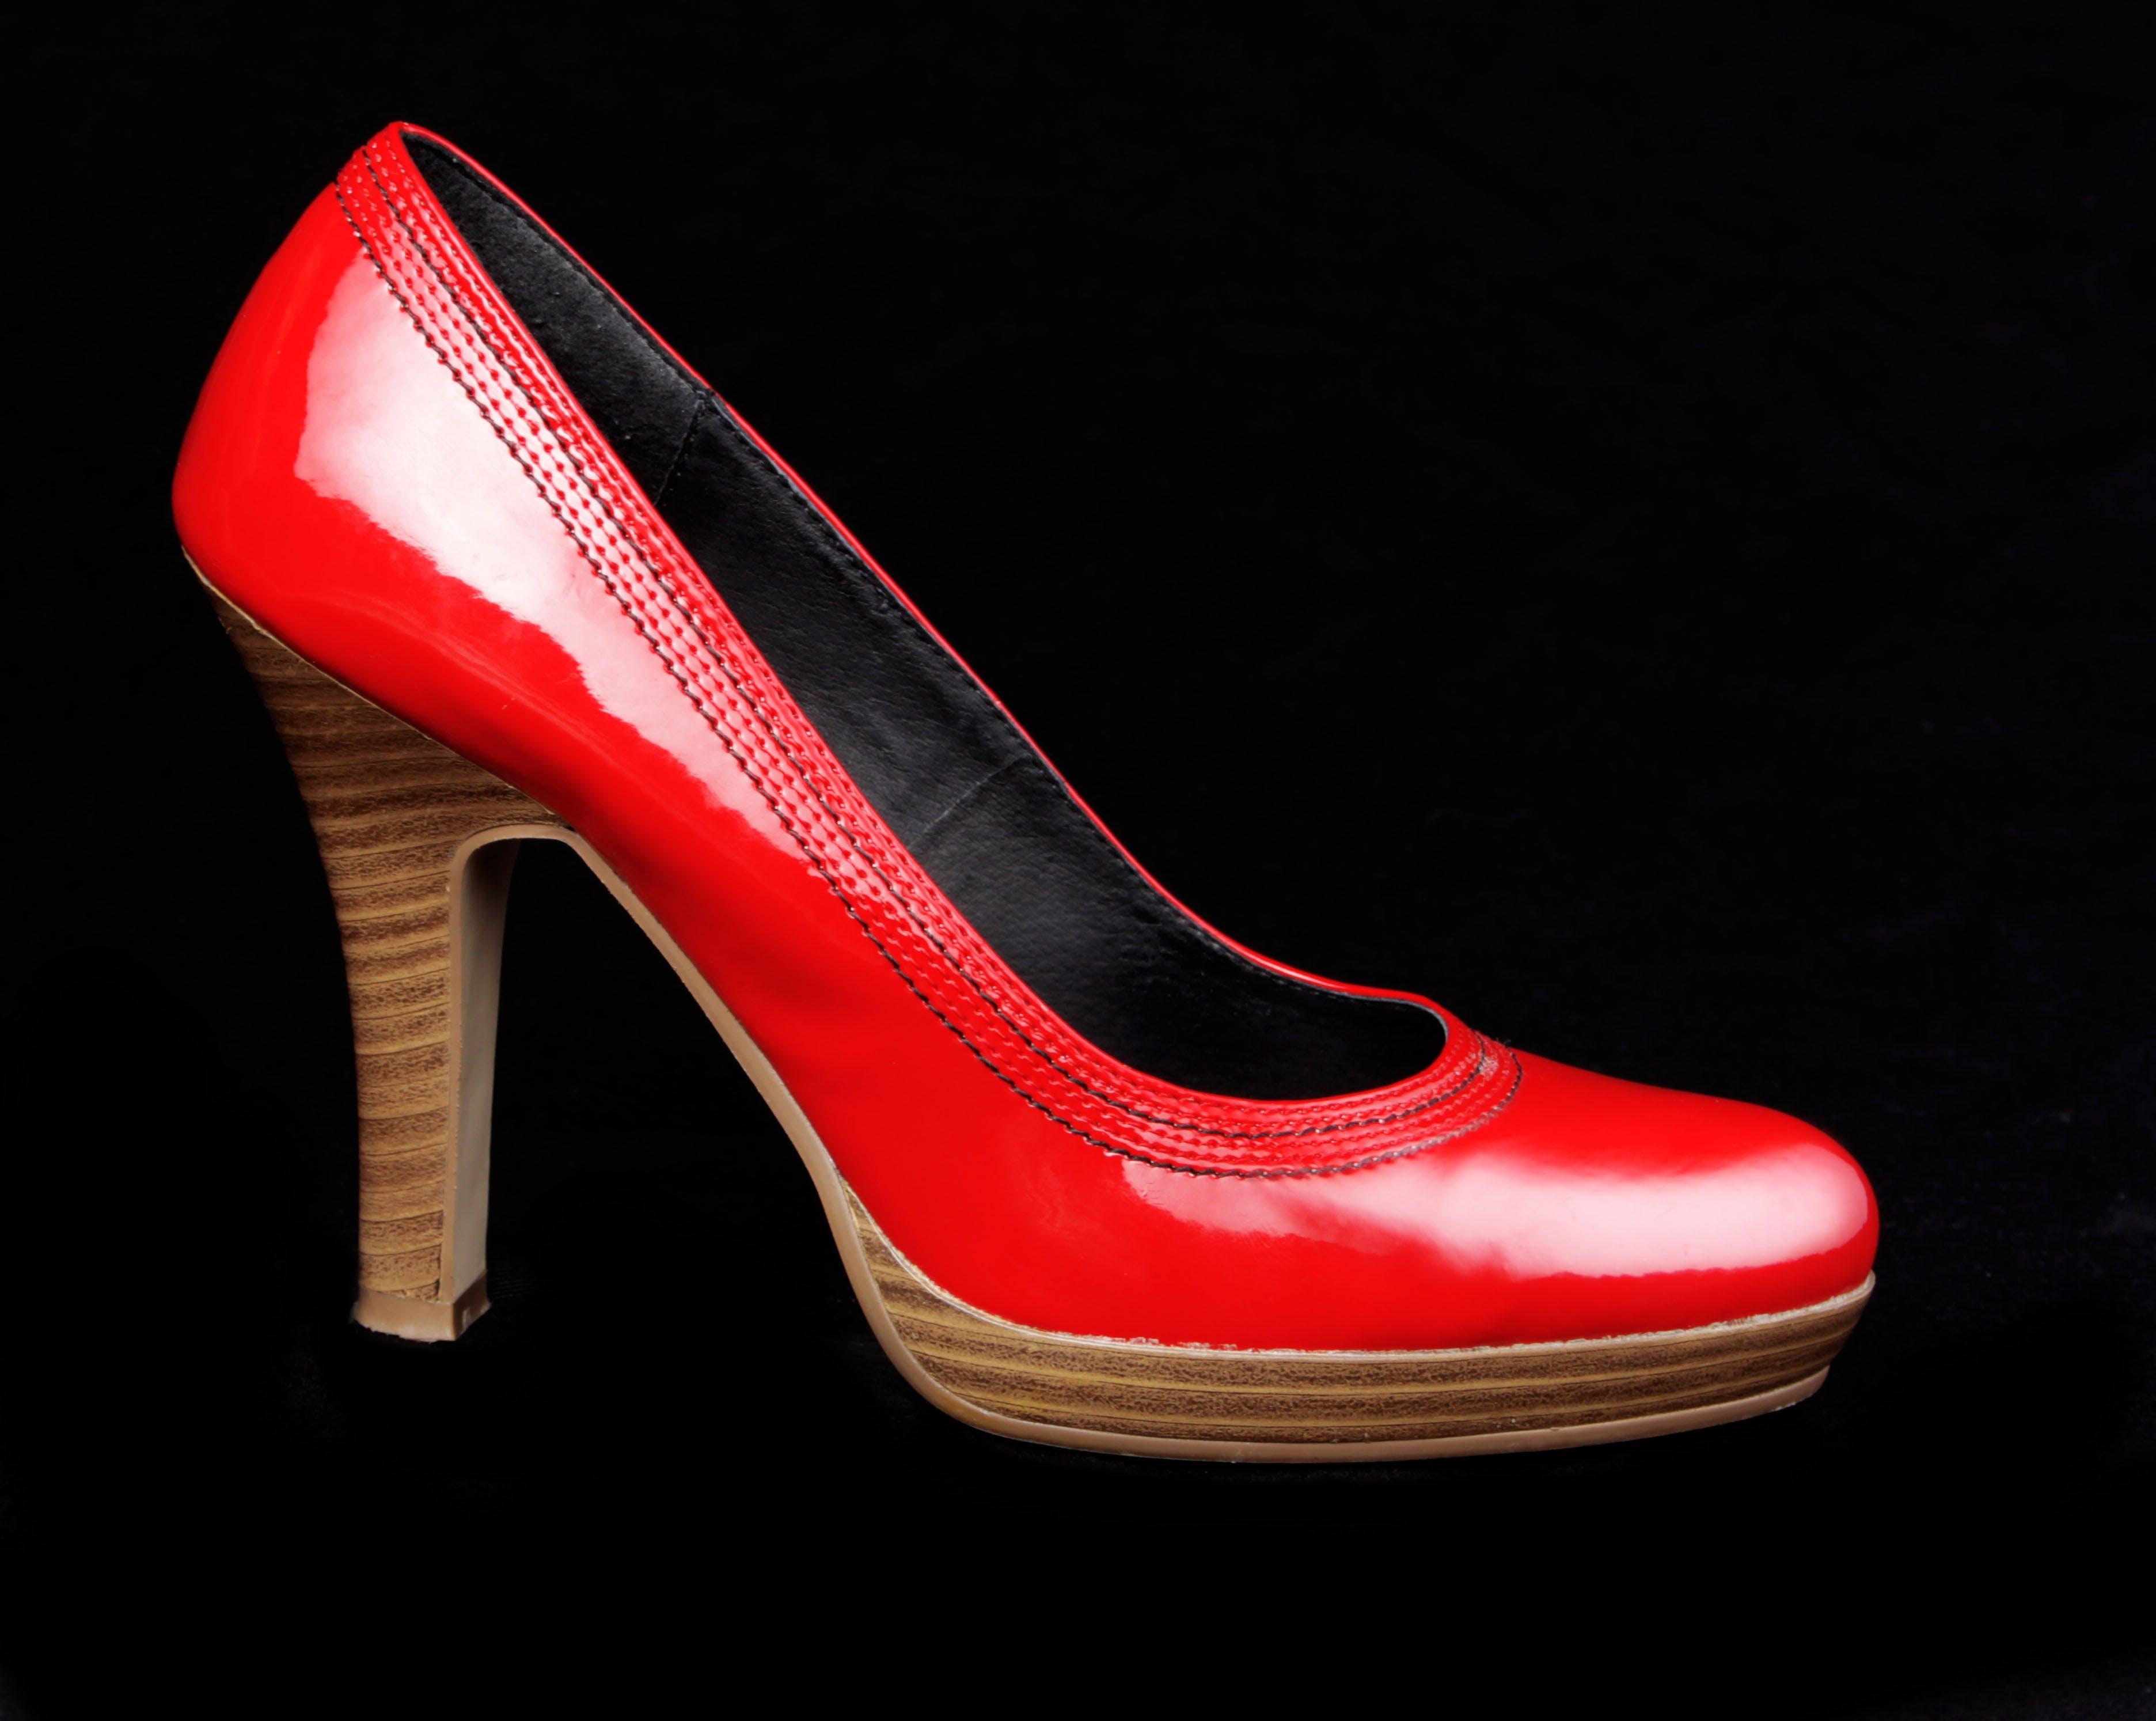 Unpaired Red Leather Platform Stacked Stilettos on Black Surface